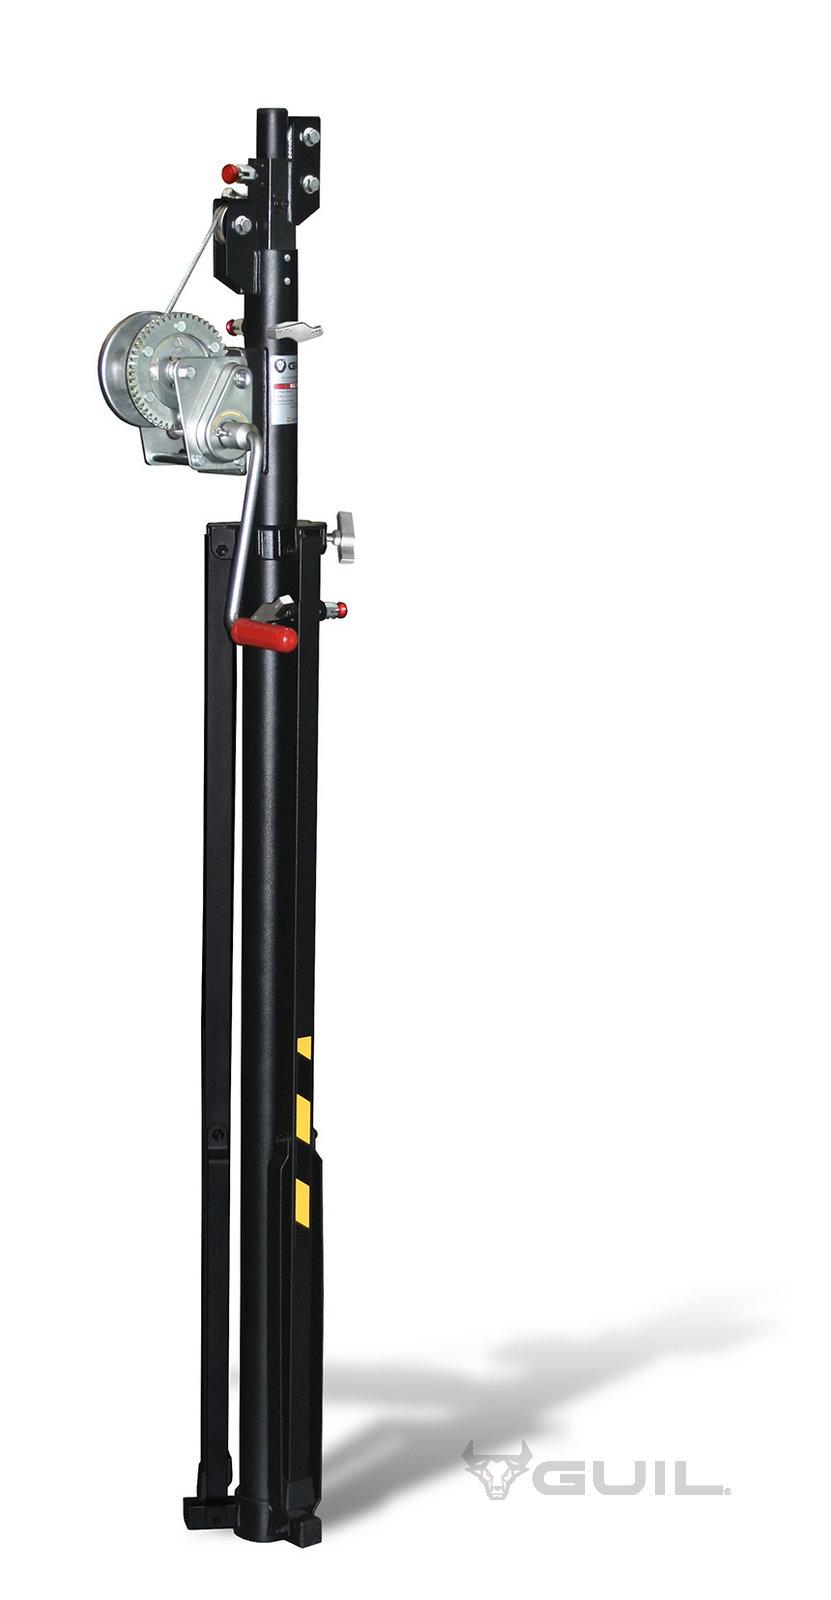 Materiaallift 1,7-4,0 m 100 kg (dutch) (2)